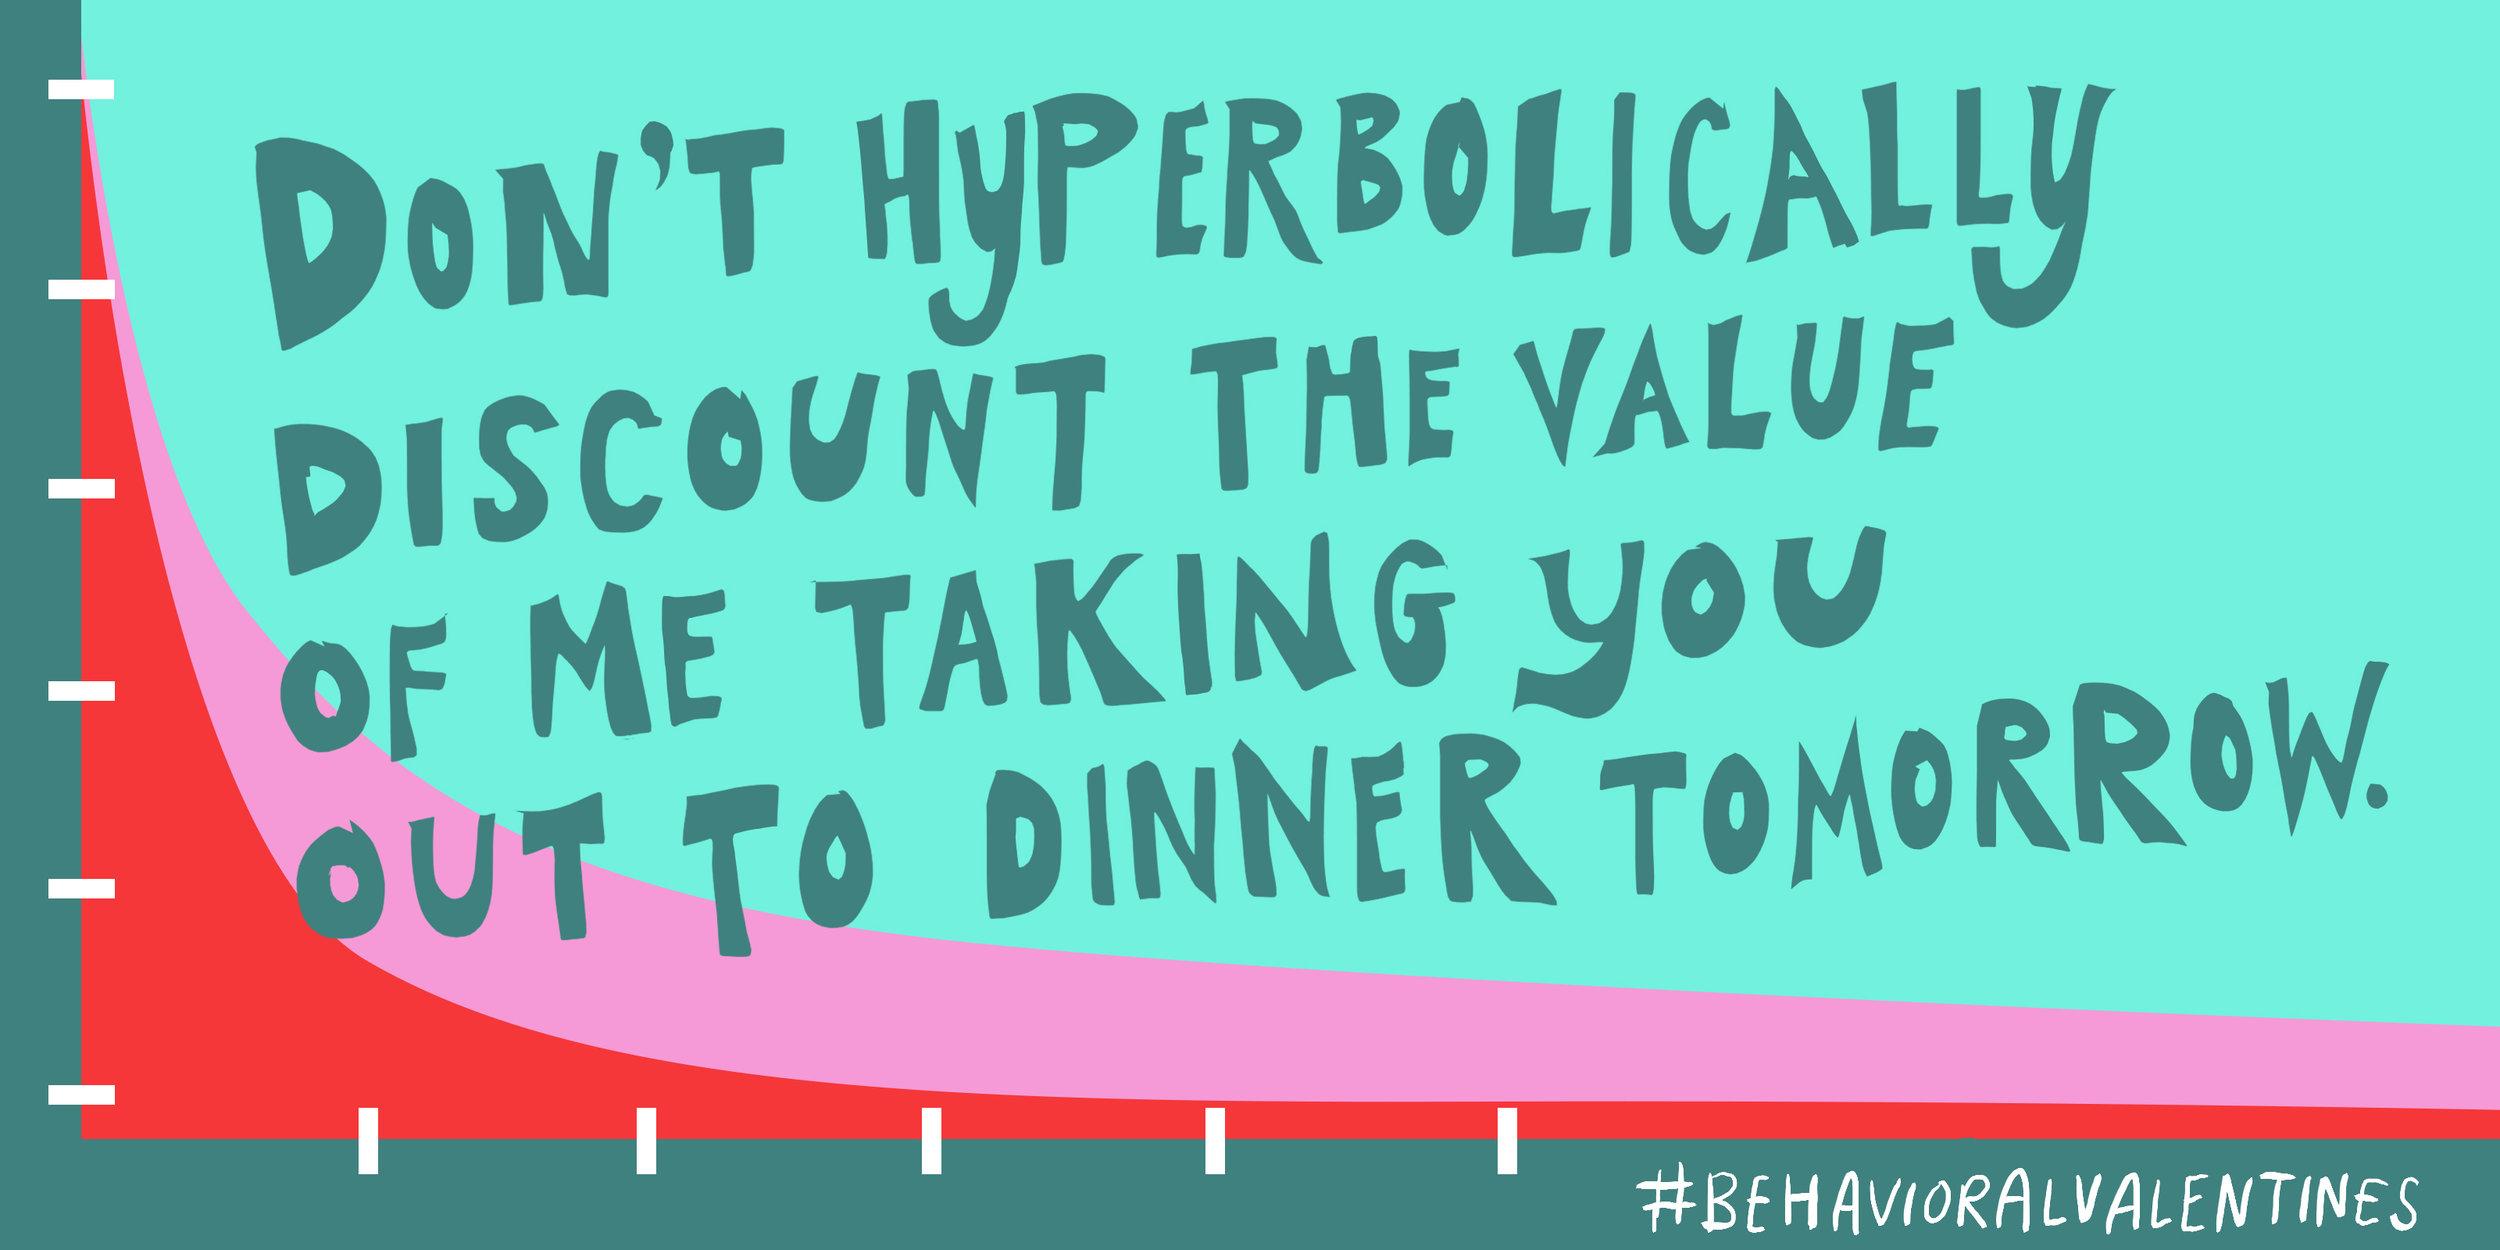 Share this #BehavioralValentine on Twitter